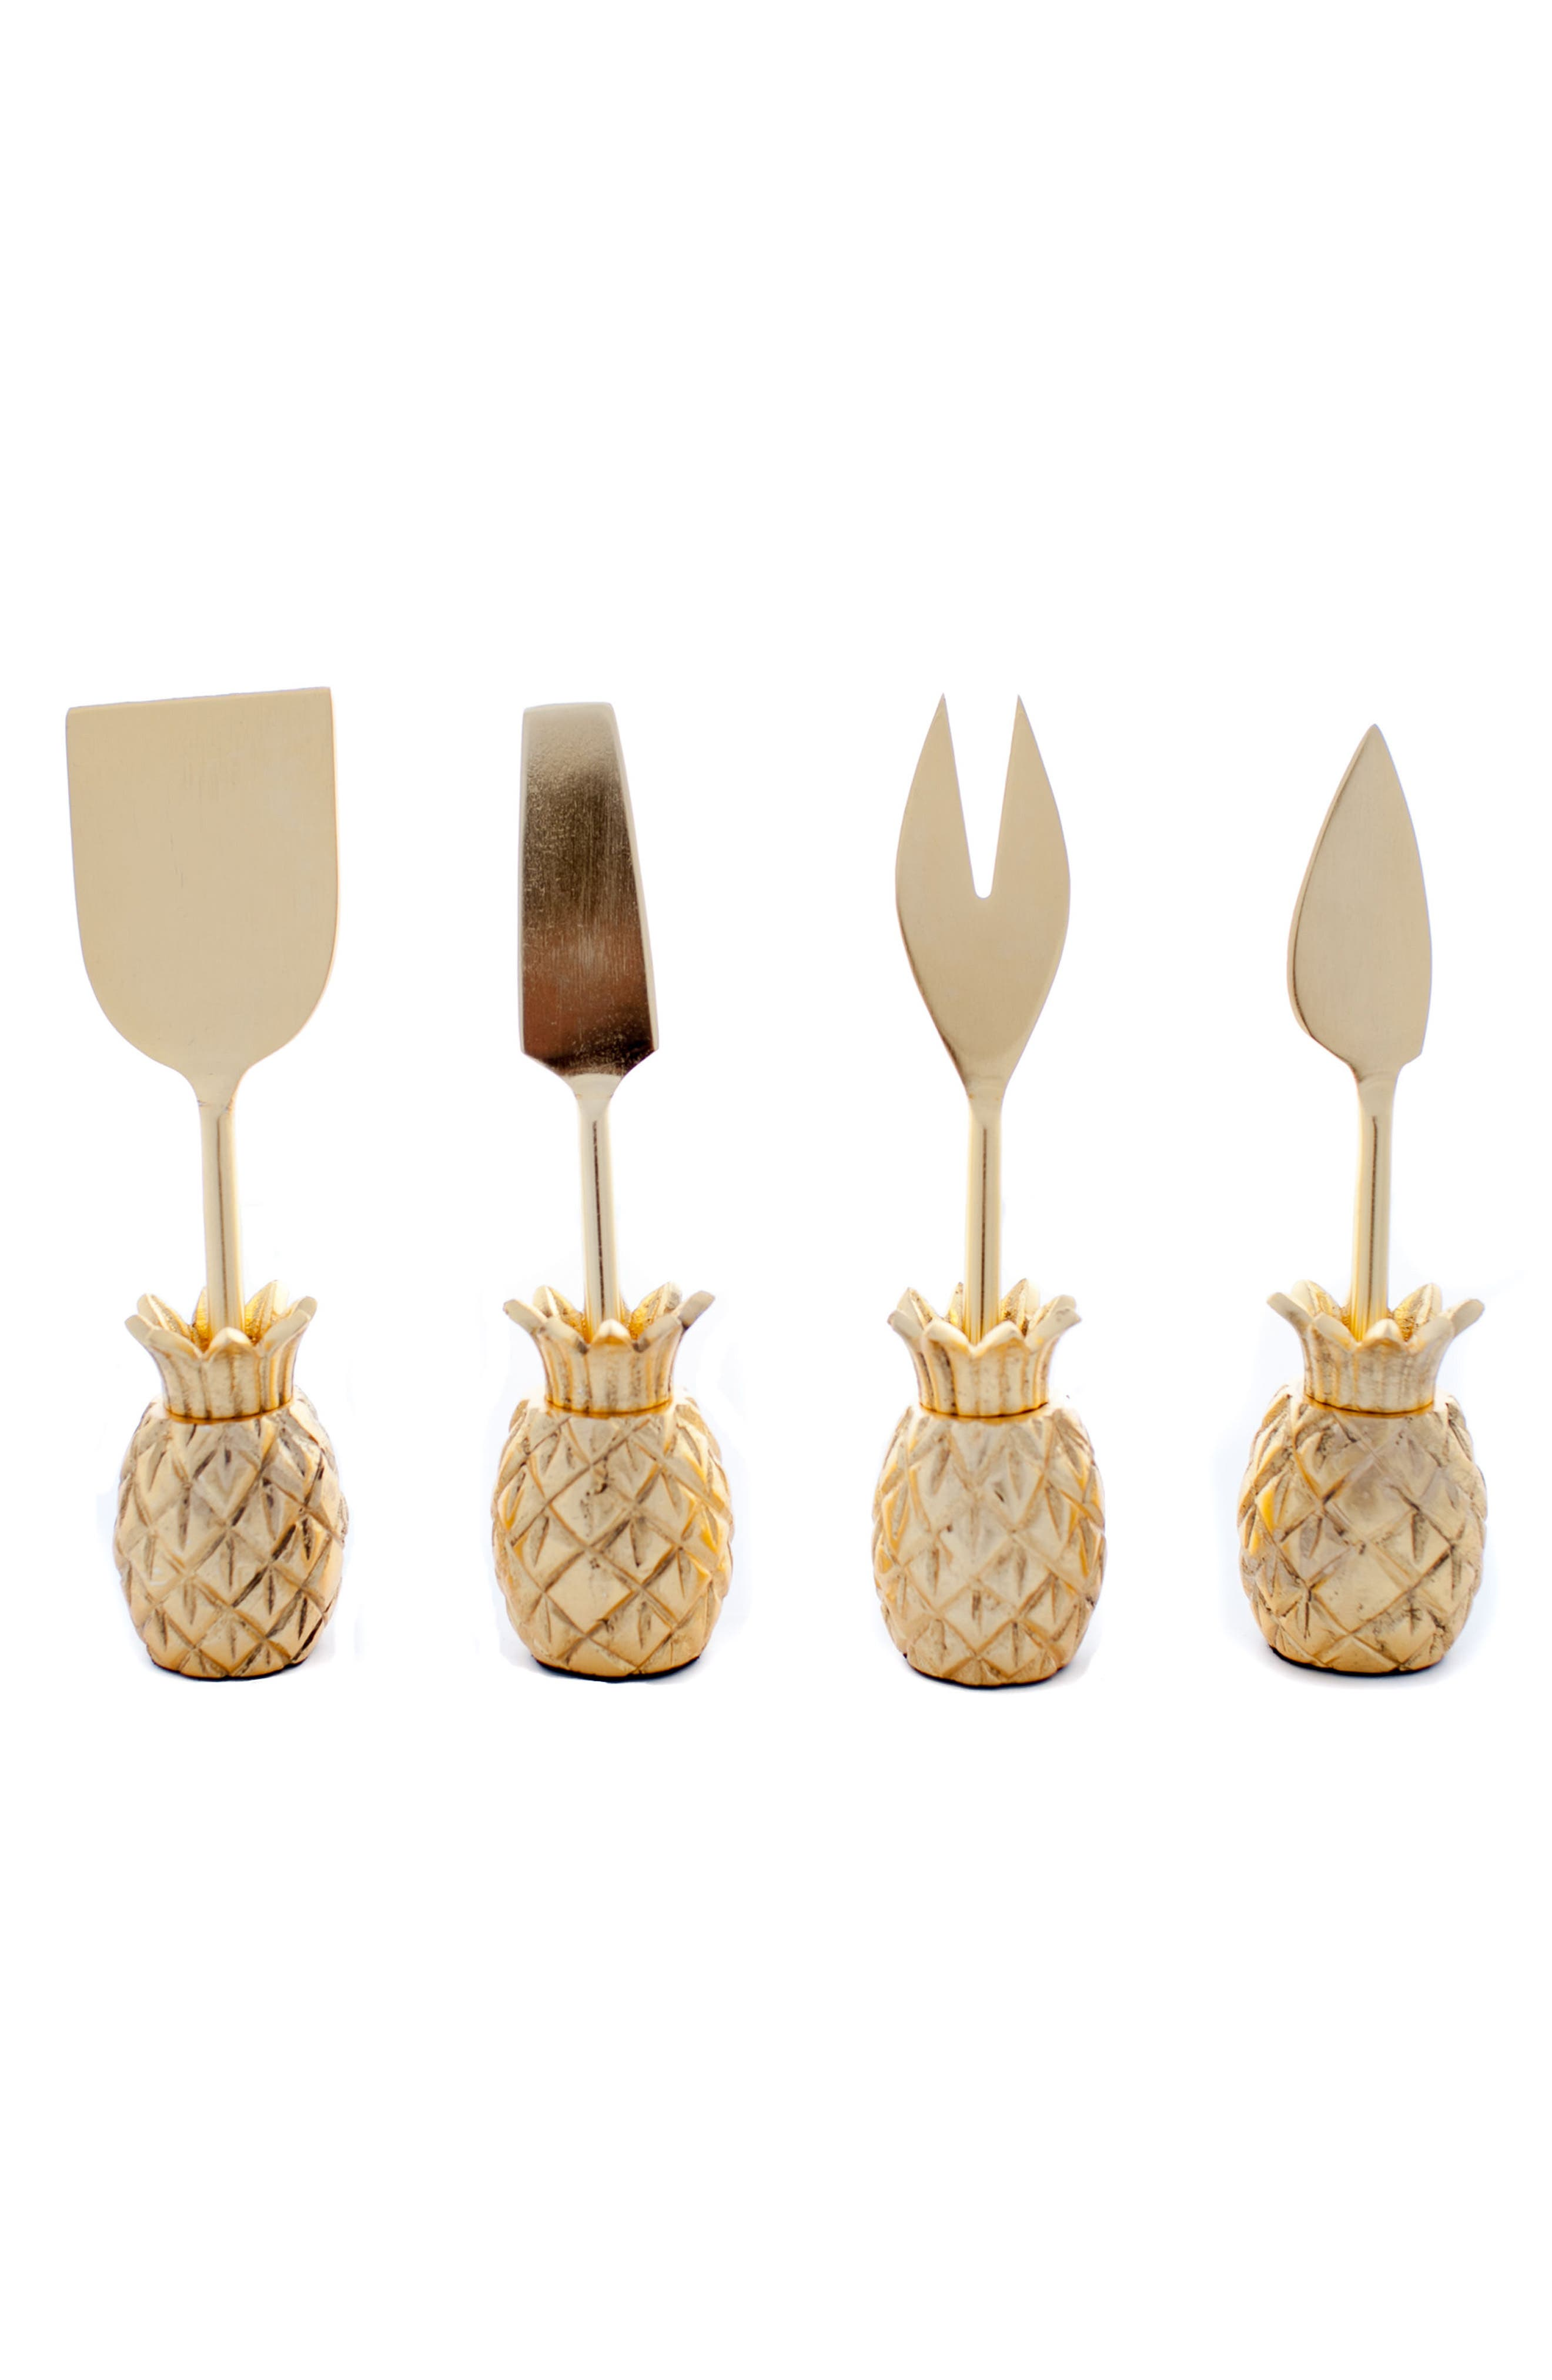 zestt Luau Set of 4 Cheese Knives